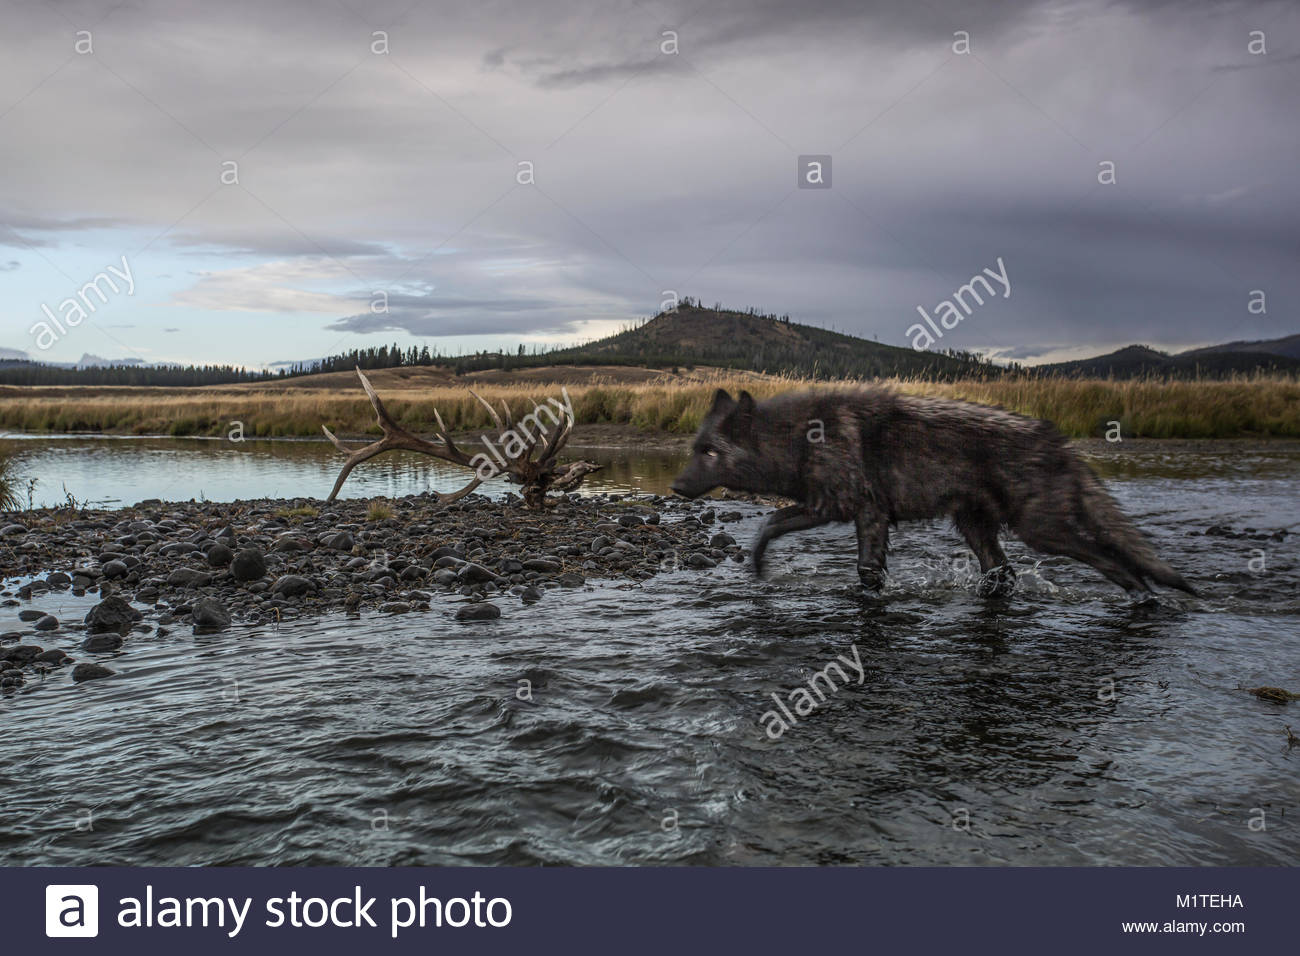 Yellowstone National Park, Wyoming. - Stock Image